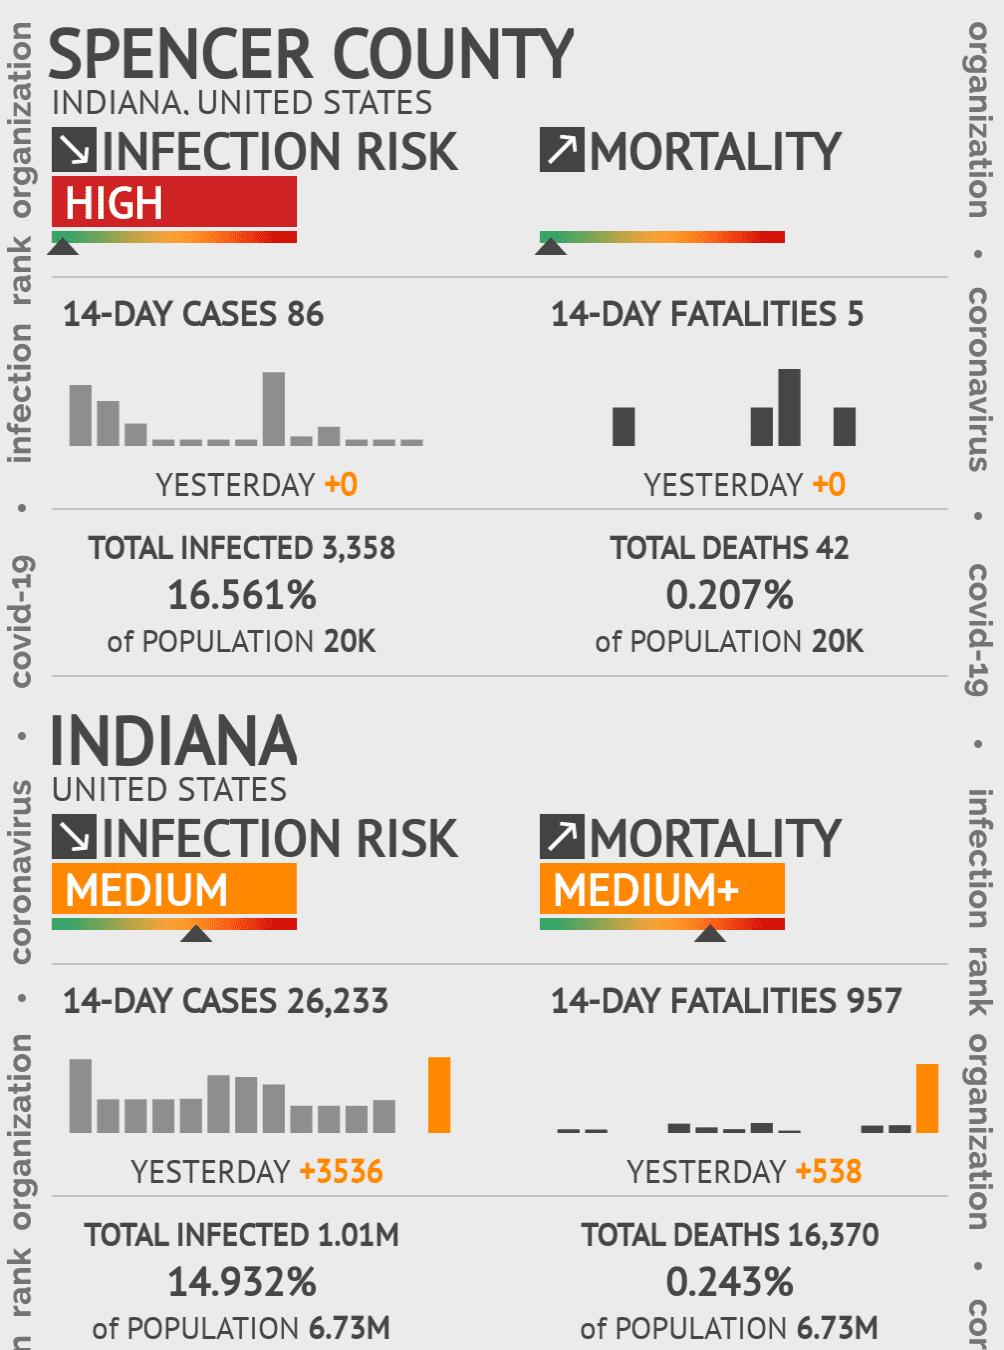 Spencer County Coronavirus Covid-19 Risk of Infection on December 03, 2020